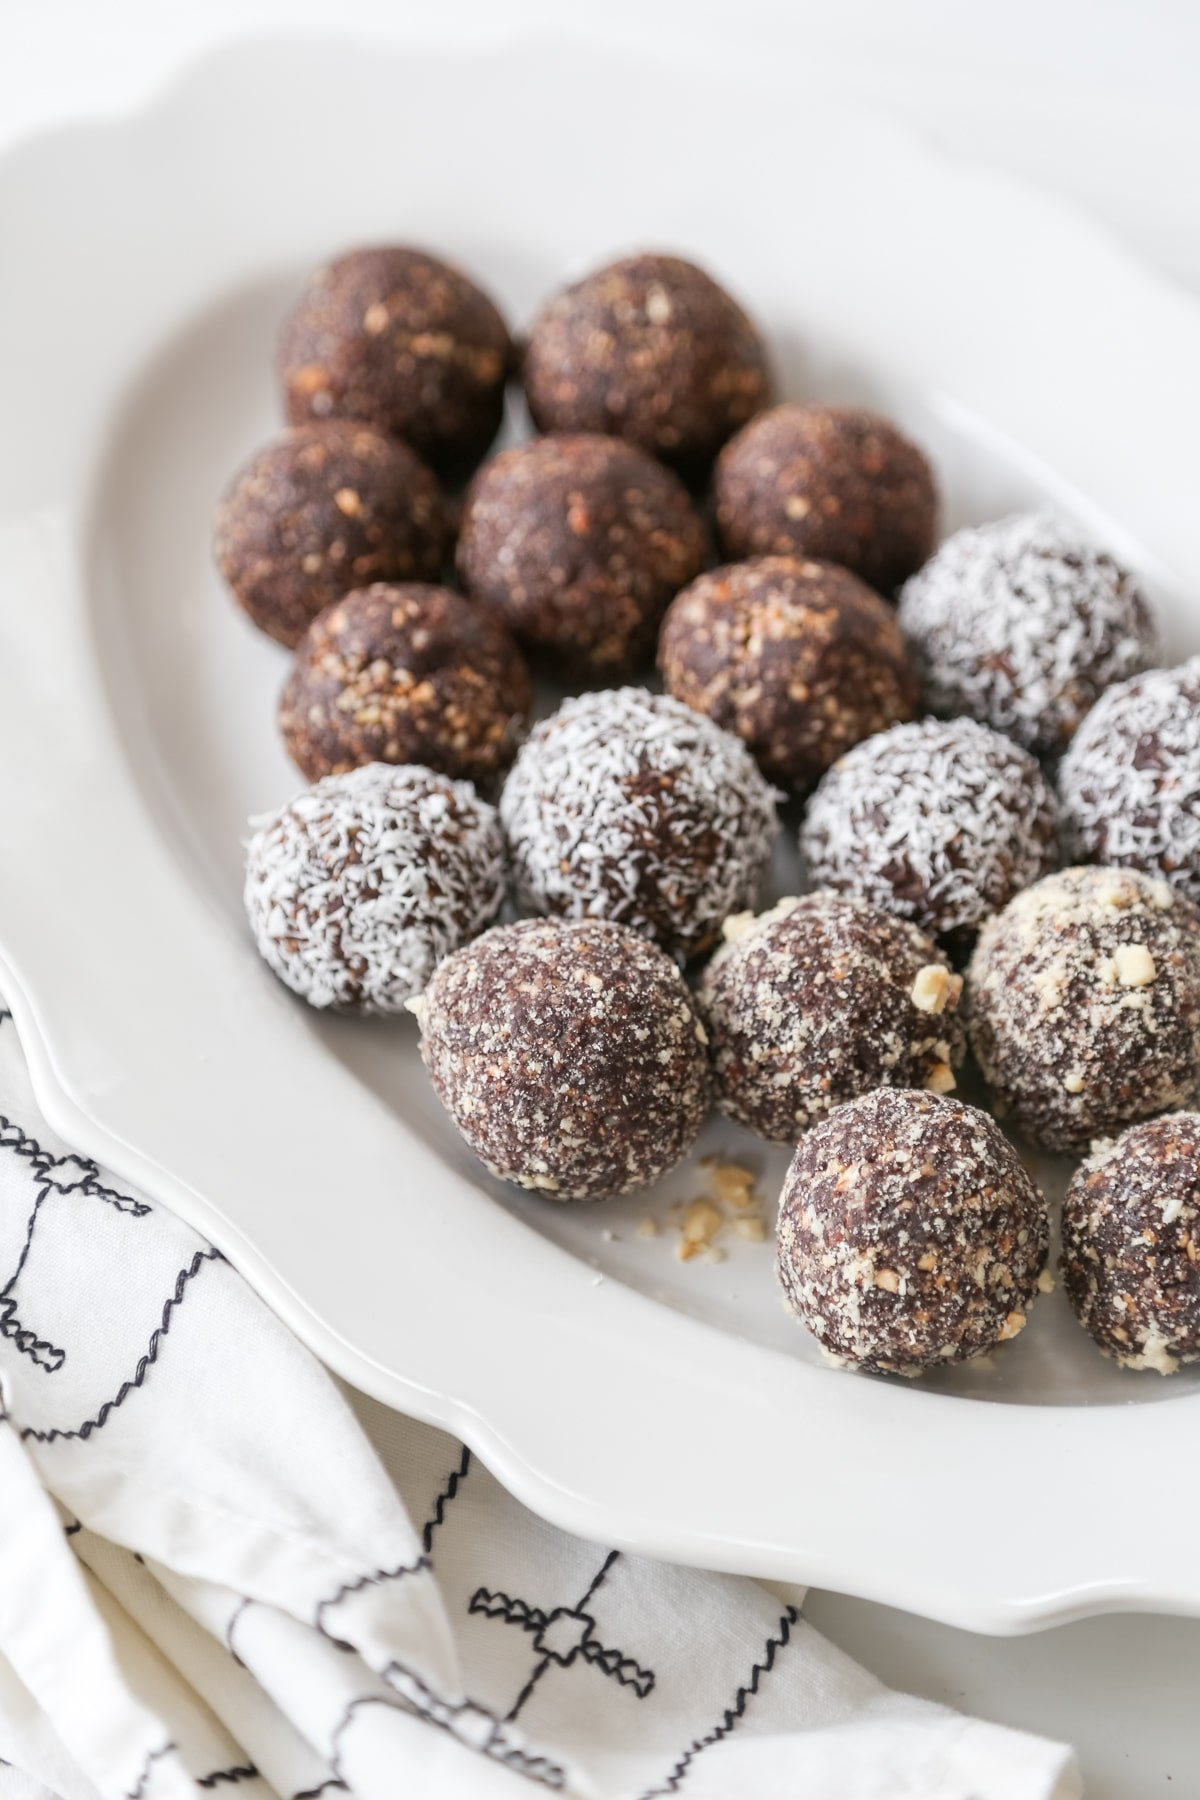 Vegan chocolate breakfast balls, some rolled in shredded coconut, on a white scalloped edged platter.